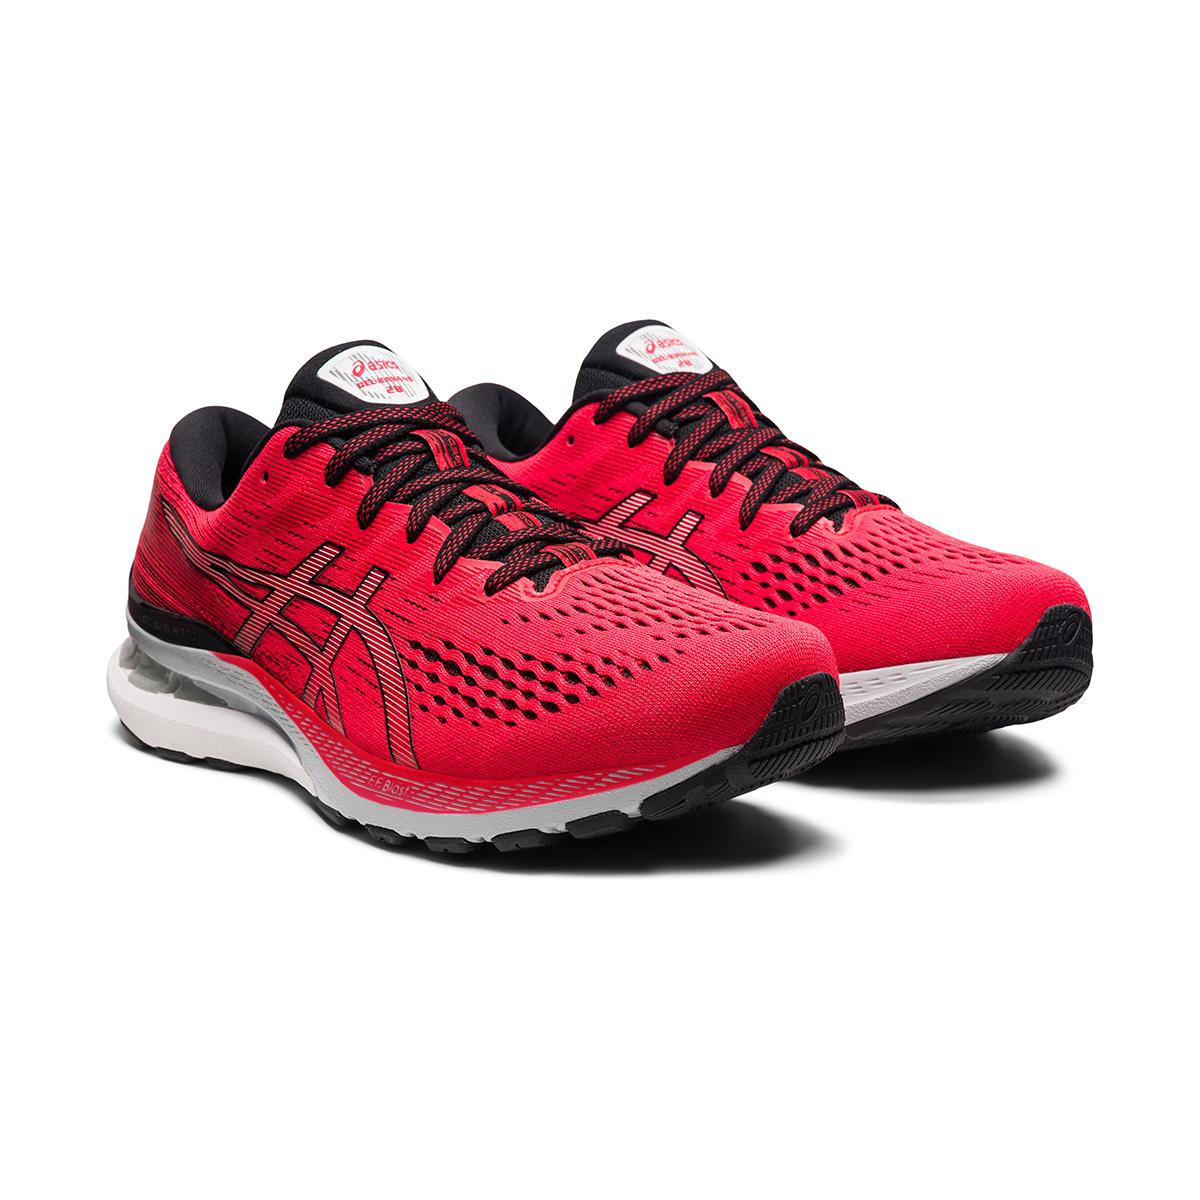 Men's Asics Gel-Kayano 28 Running Shoe - Color: Electric Red - Size: 7 - Width: Regular, Electric Red, large, image 5